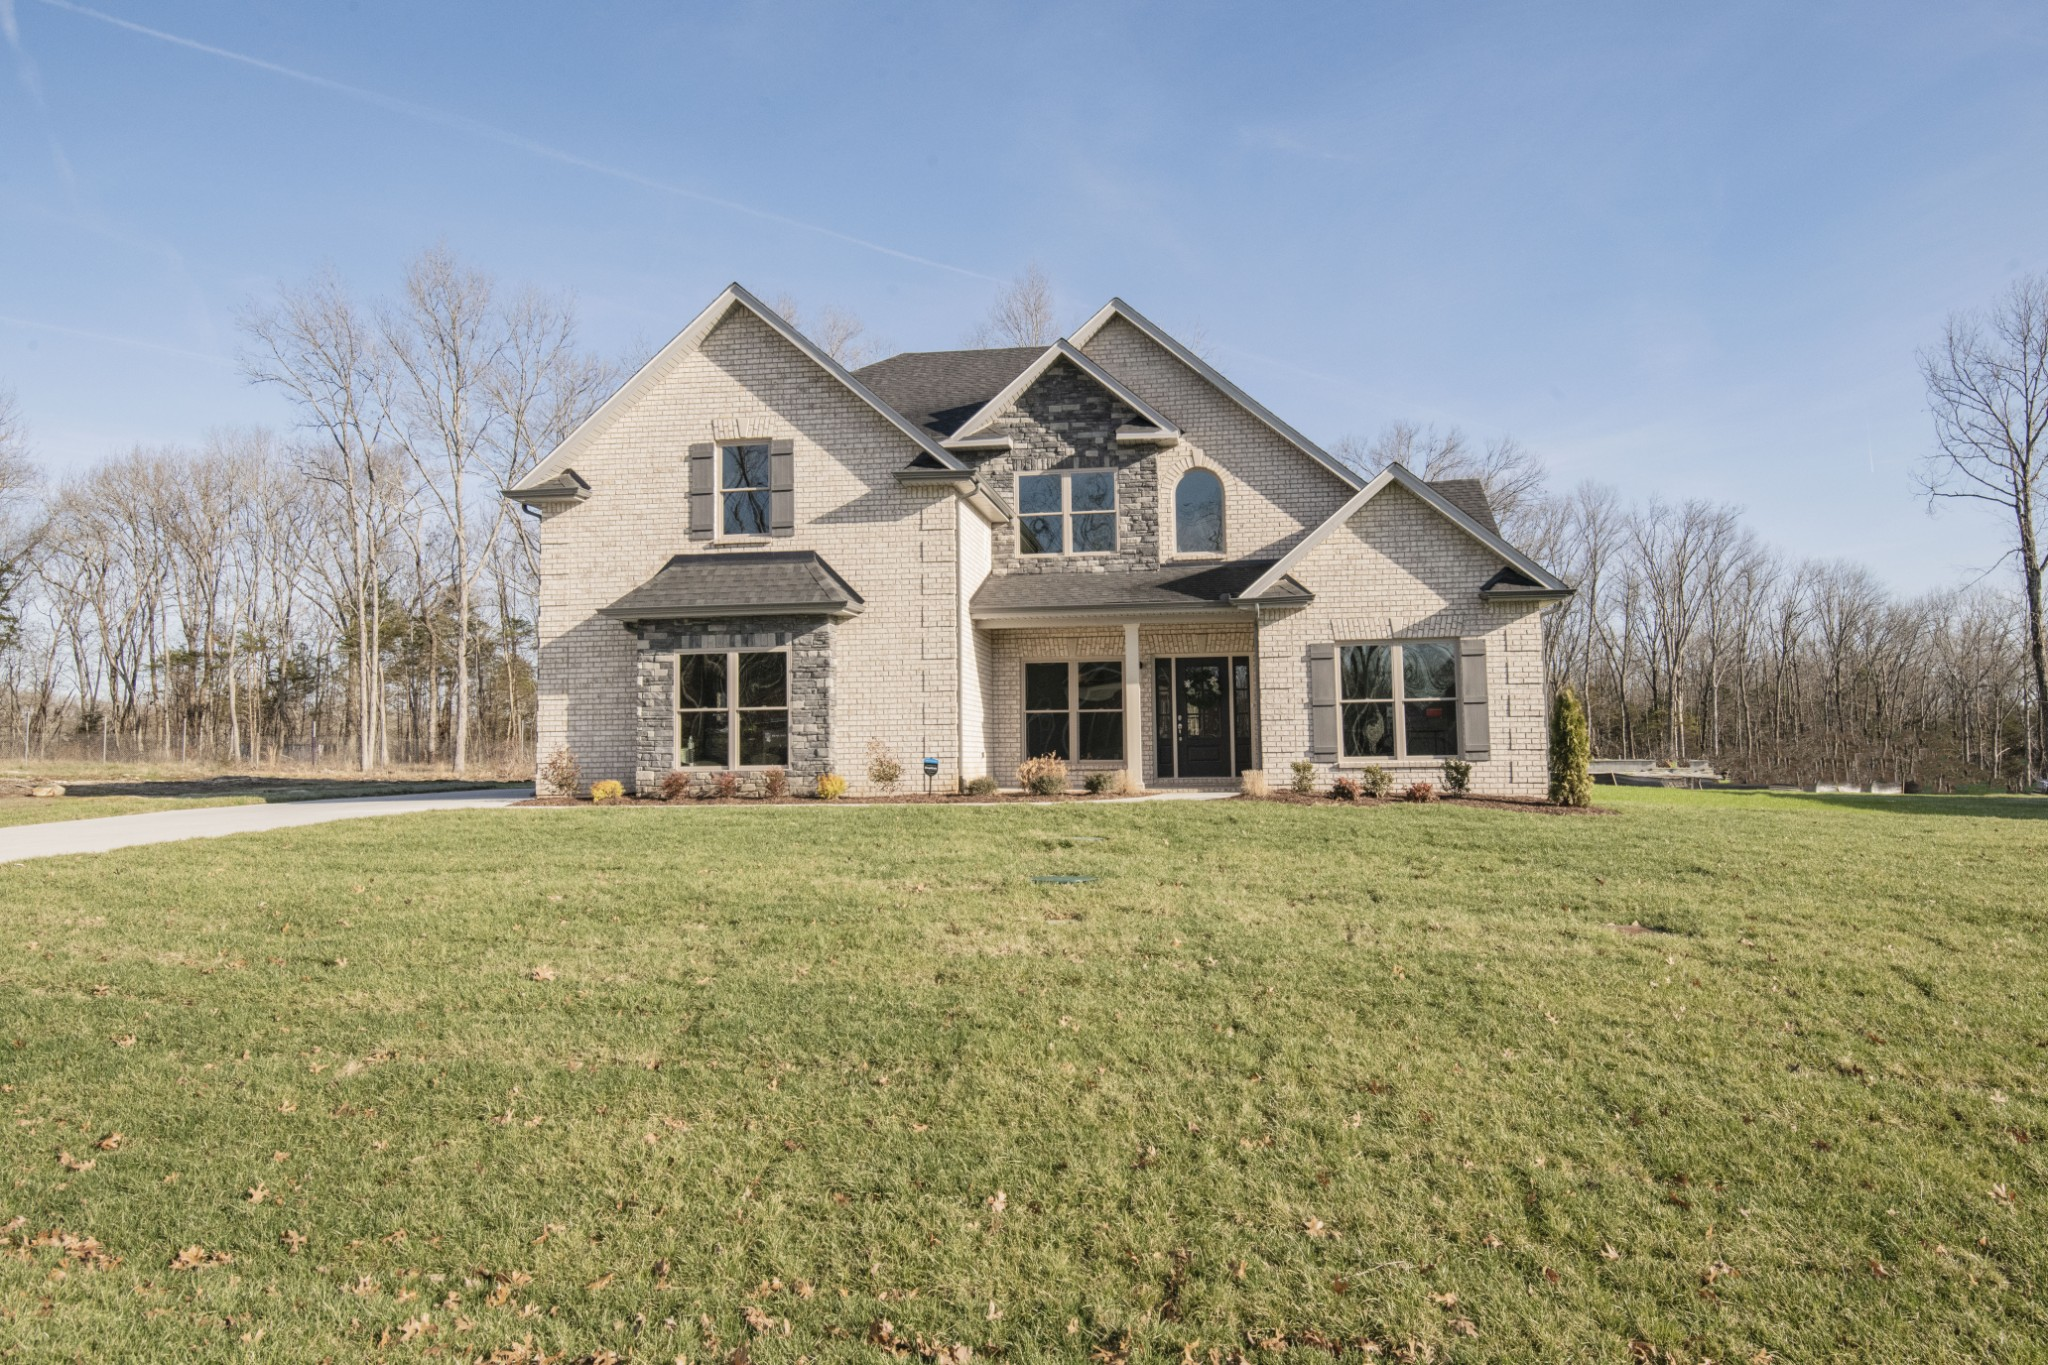 Madison Cove Homes For Sale Murfreesboro